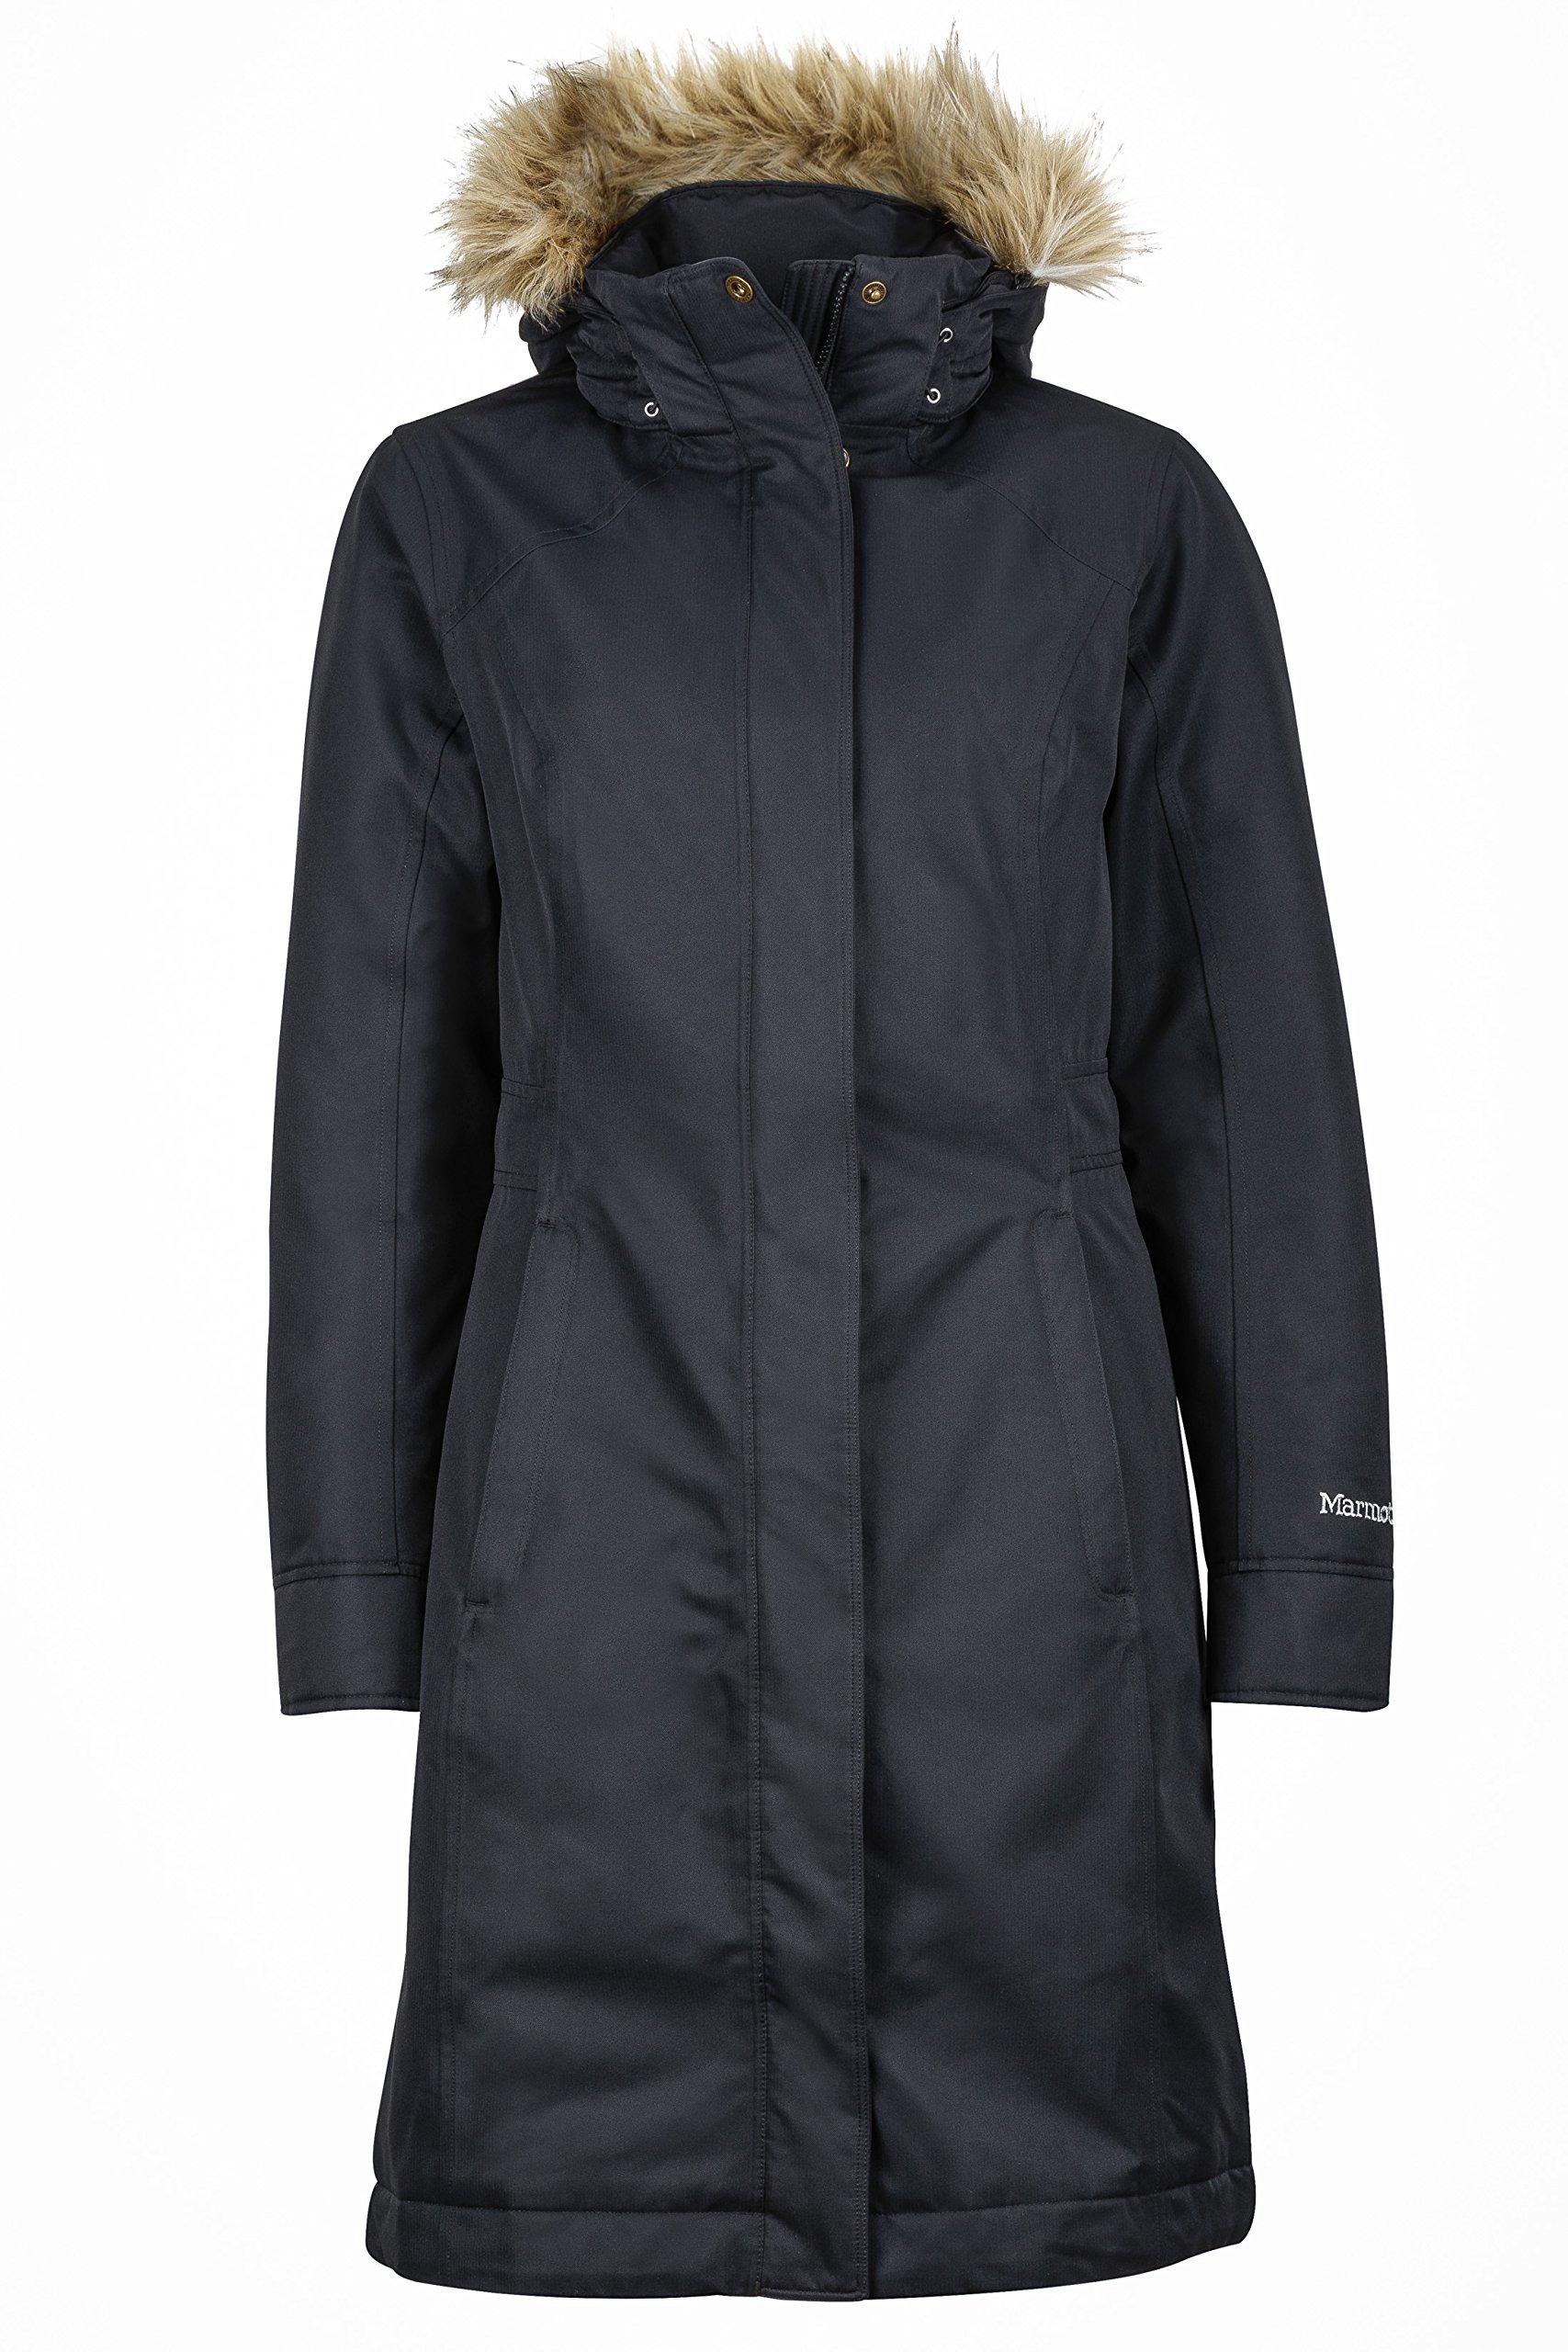 Marmot Women Wm's Chelsea Coat Leichte Daunenjacke, 700 Fill-Power, Warmer Parka